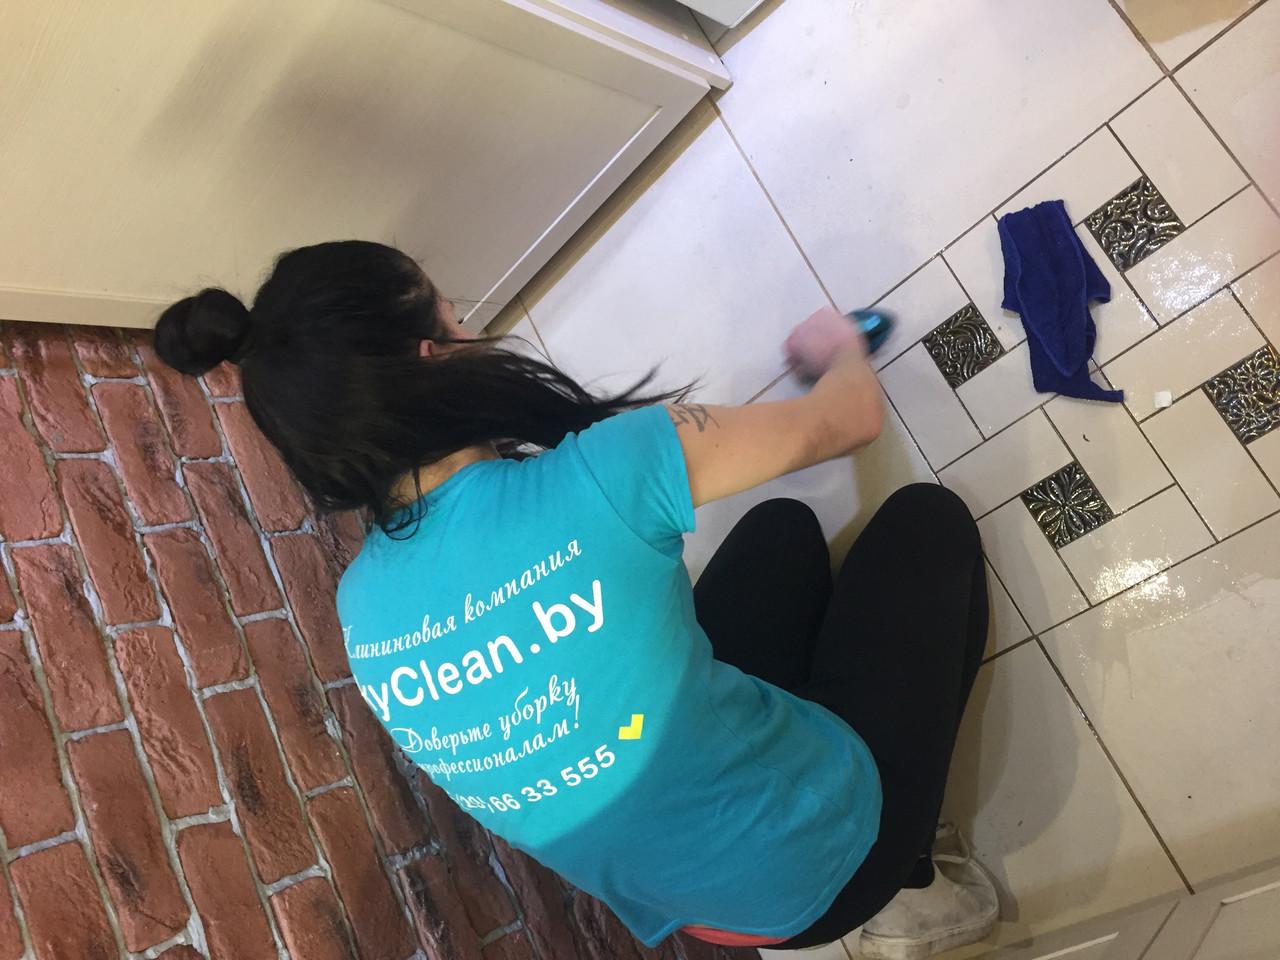 ScyClean - клининговые услуги, уборка после ремонта (партнёр)